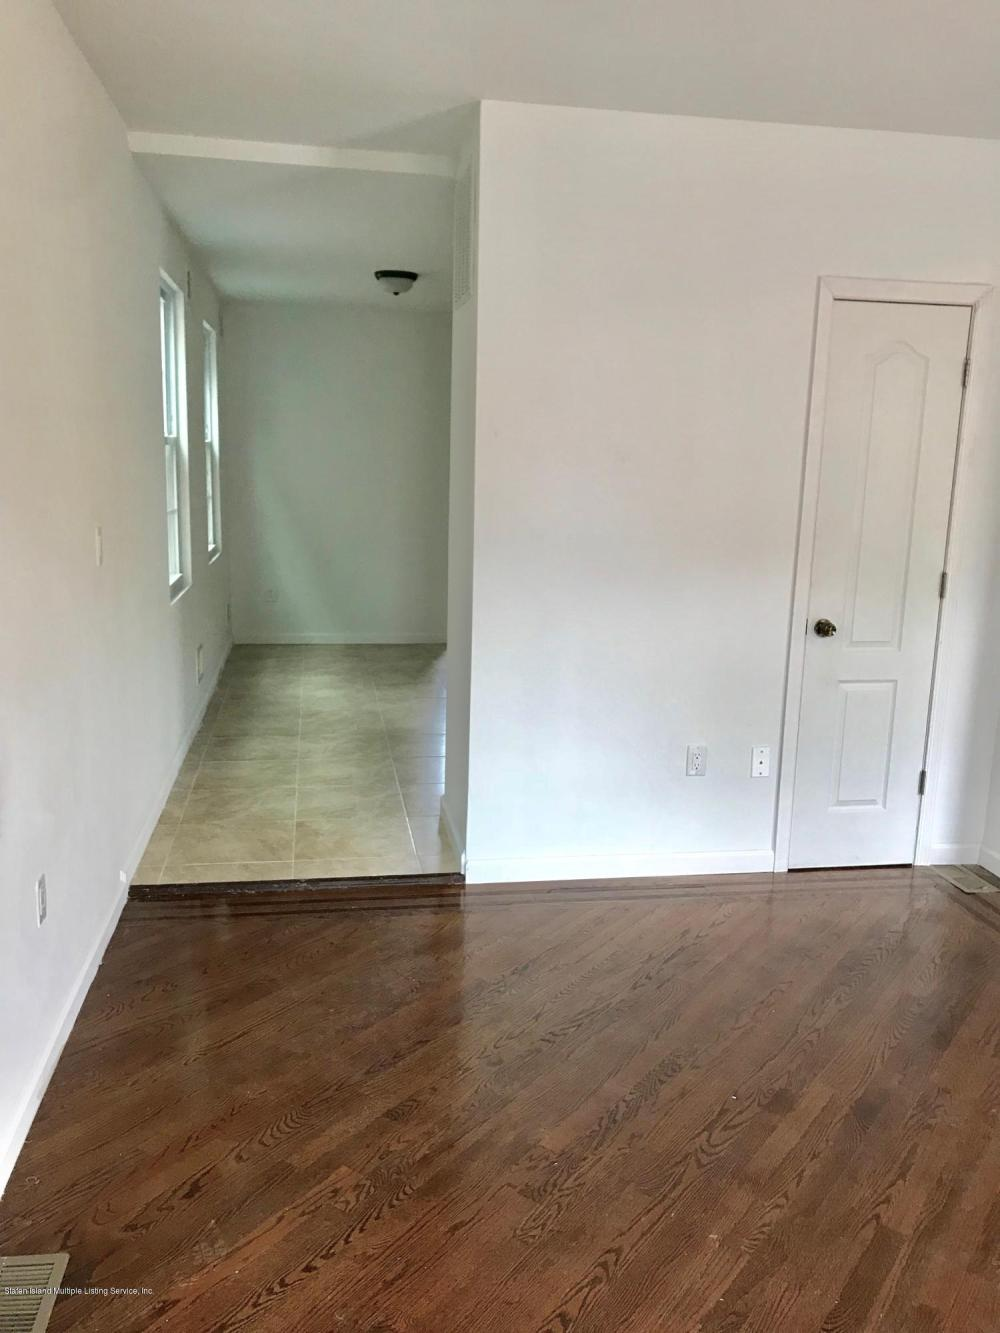 71 Gordon Street,Staten Island,New York,10301,United States,5 Bedrooms Bedrooms,9 Rooms Rooms,3 BathroomsBathrooms,Residential,Gordon,1124122